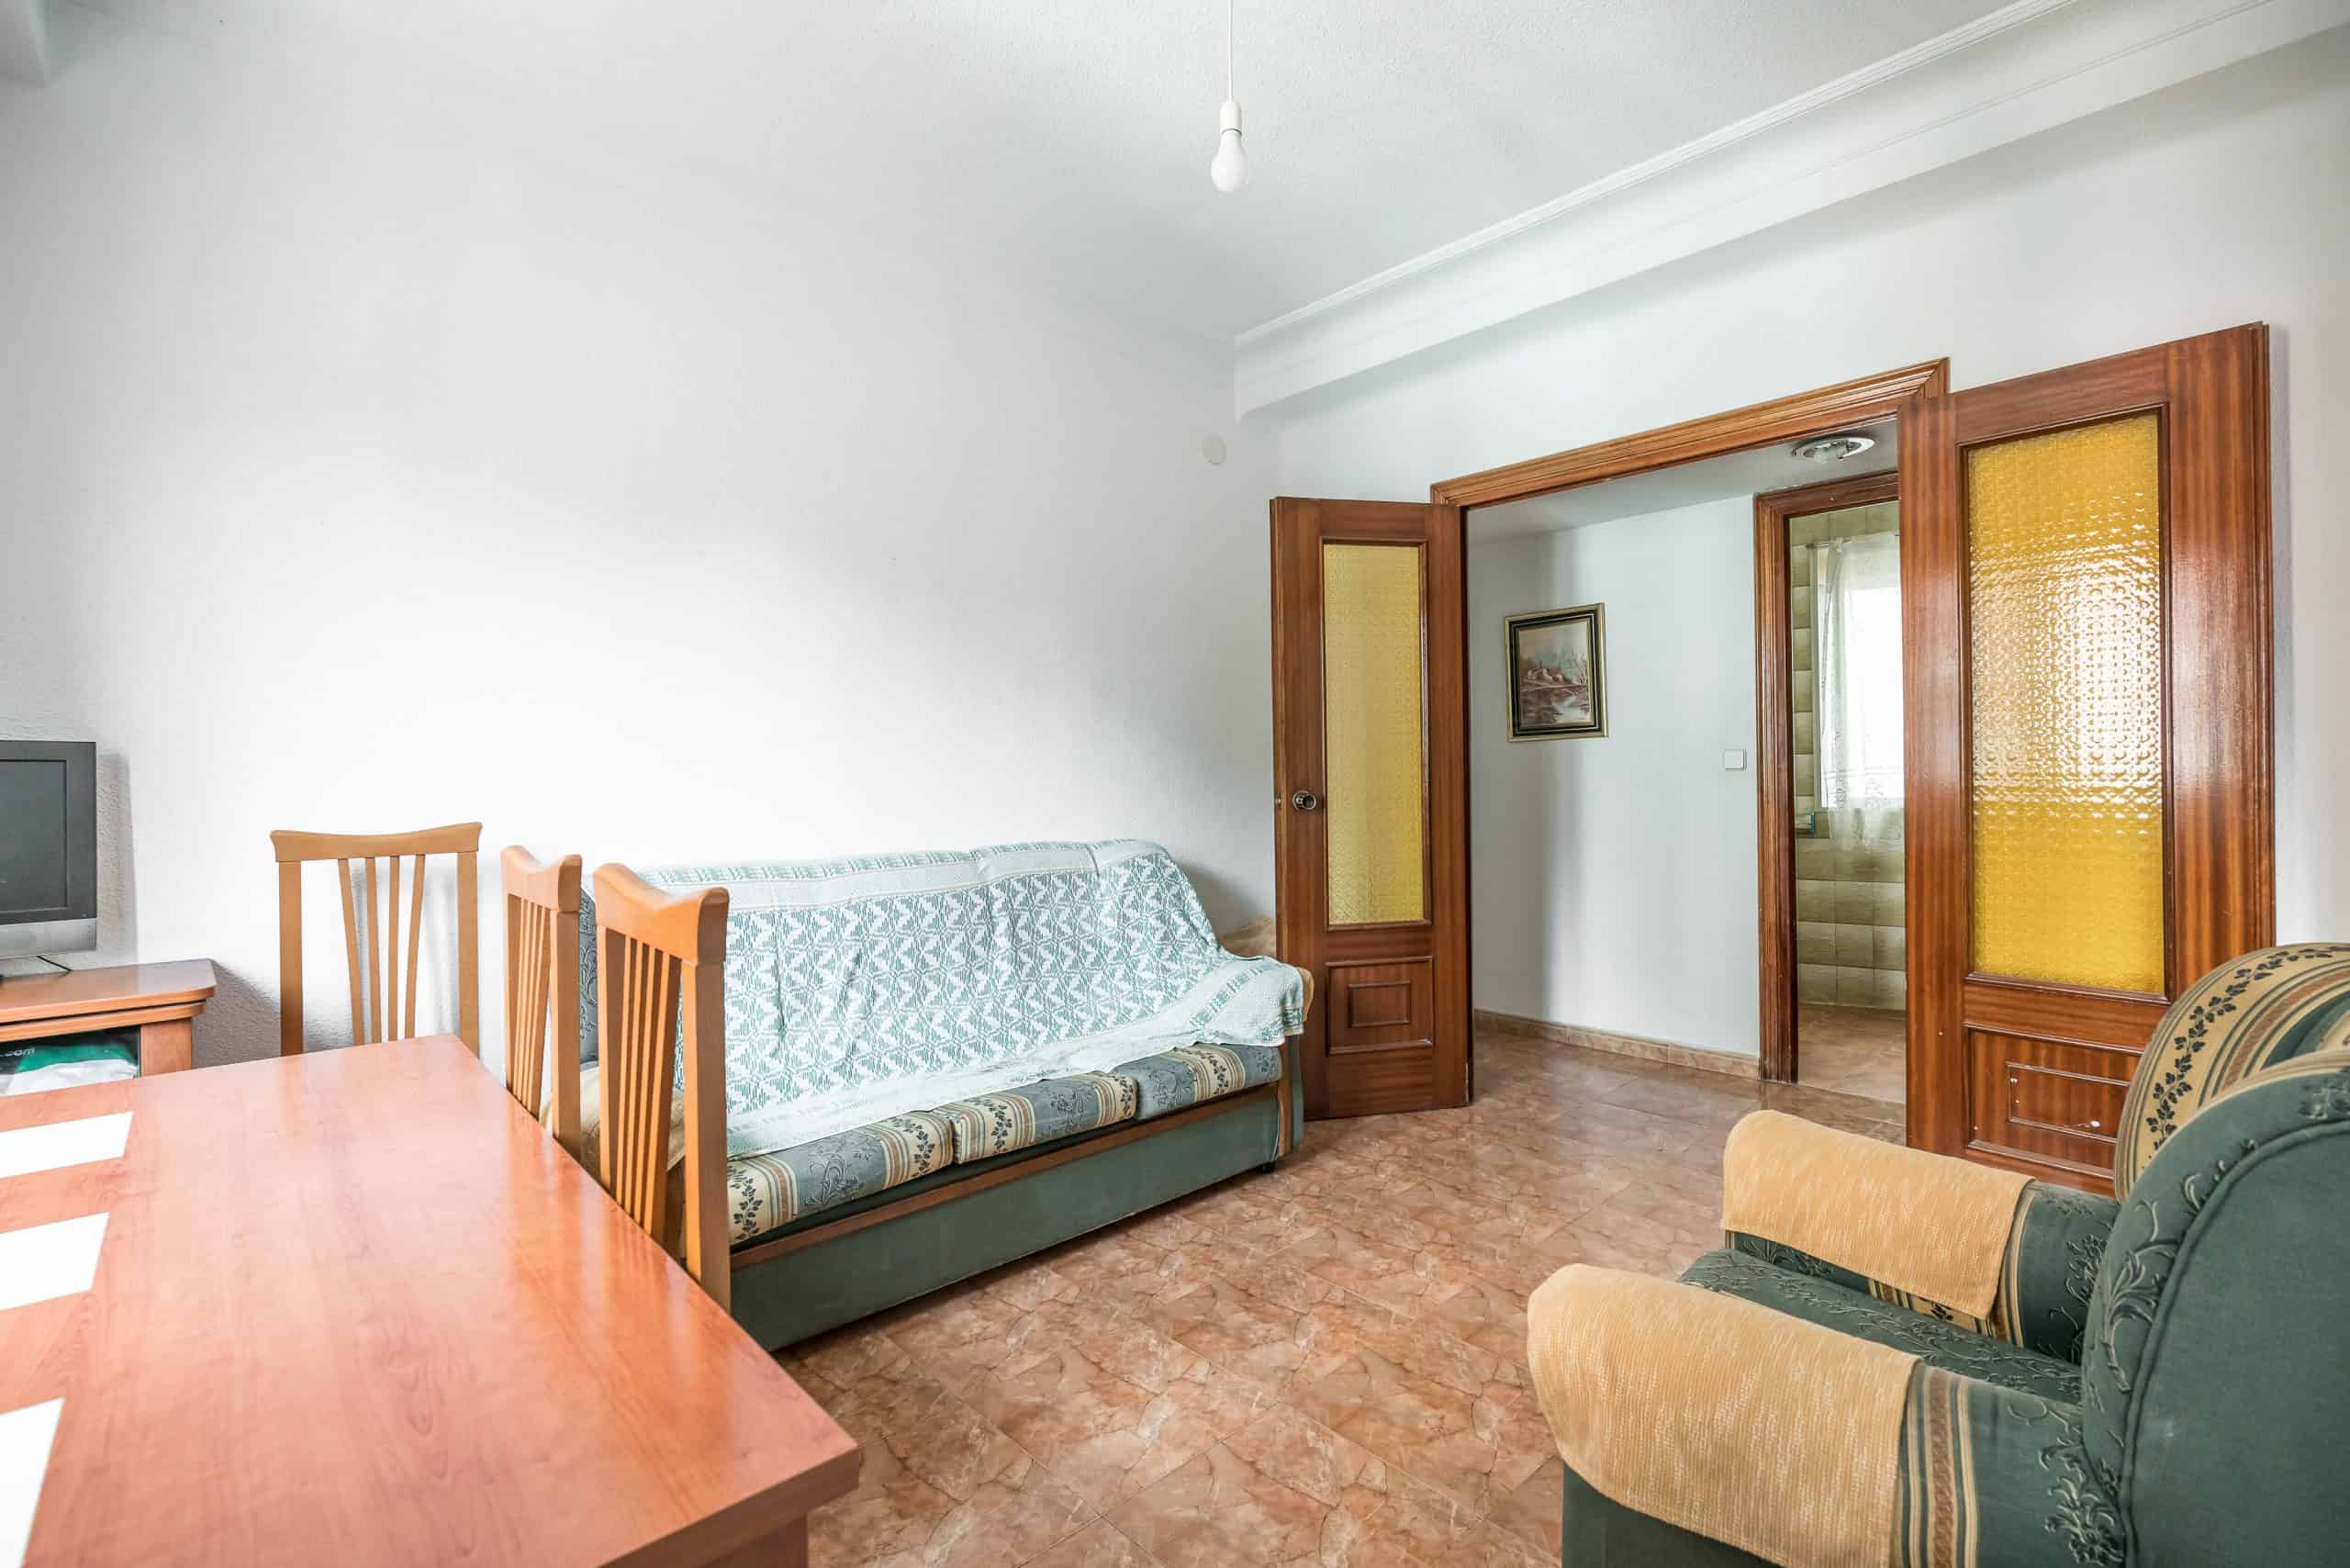 Agencia Inmobiliaria de Madrid-FUTUROCASA-calle Embajadores-Chopera-Arganzuela1 SALON (4)